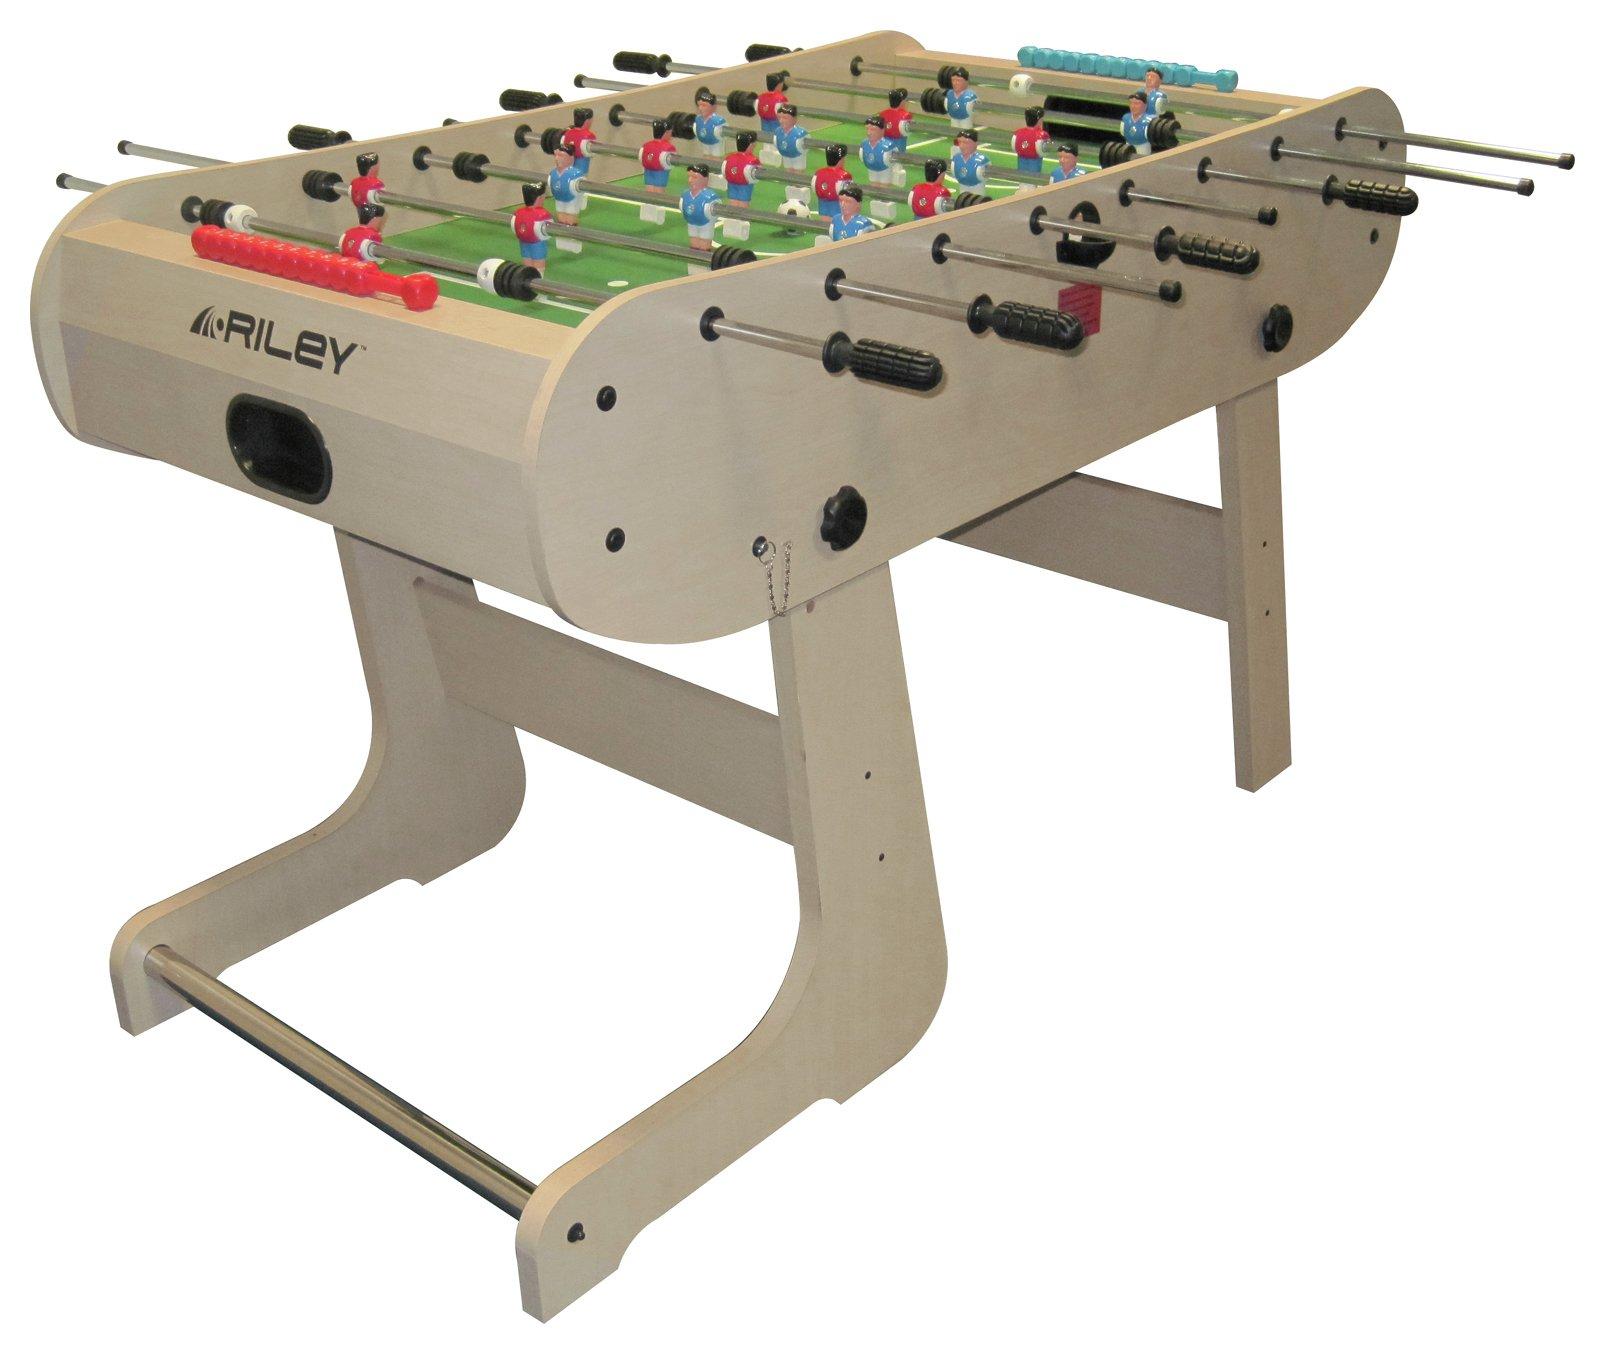 Riley 4'6 inch Folding Football Table.